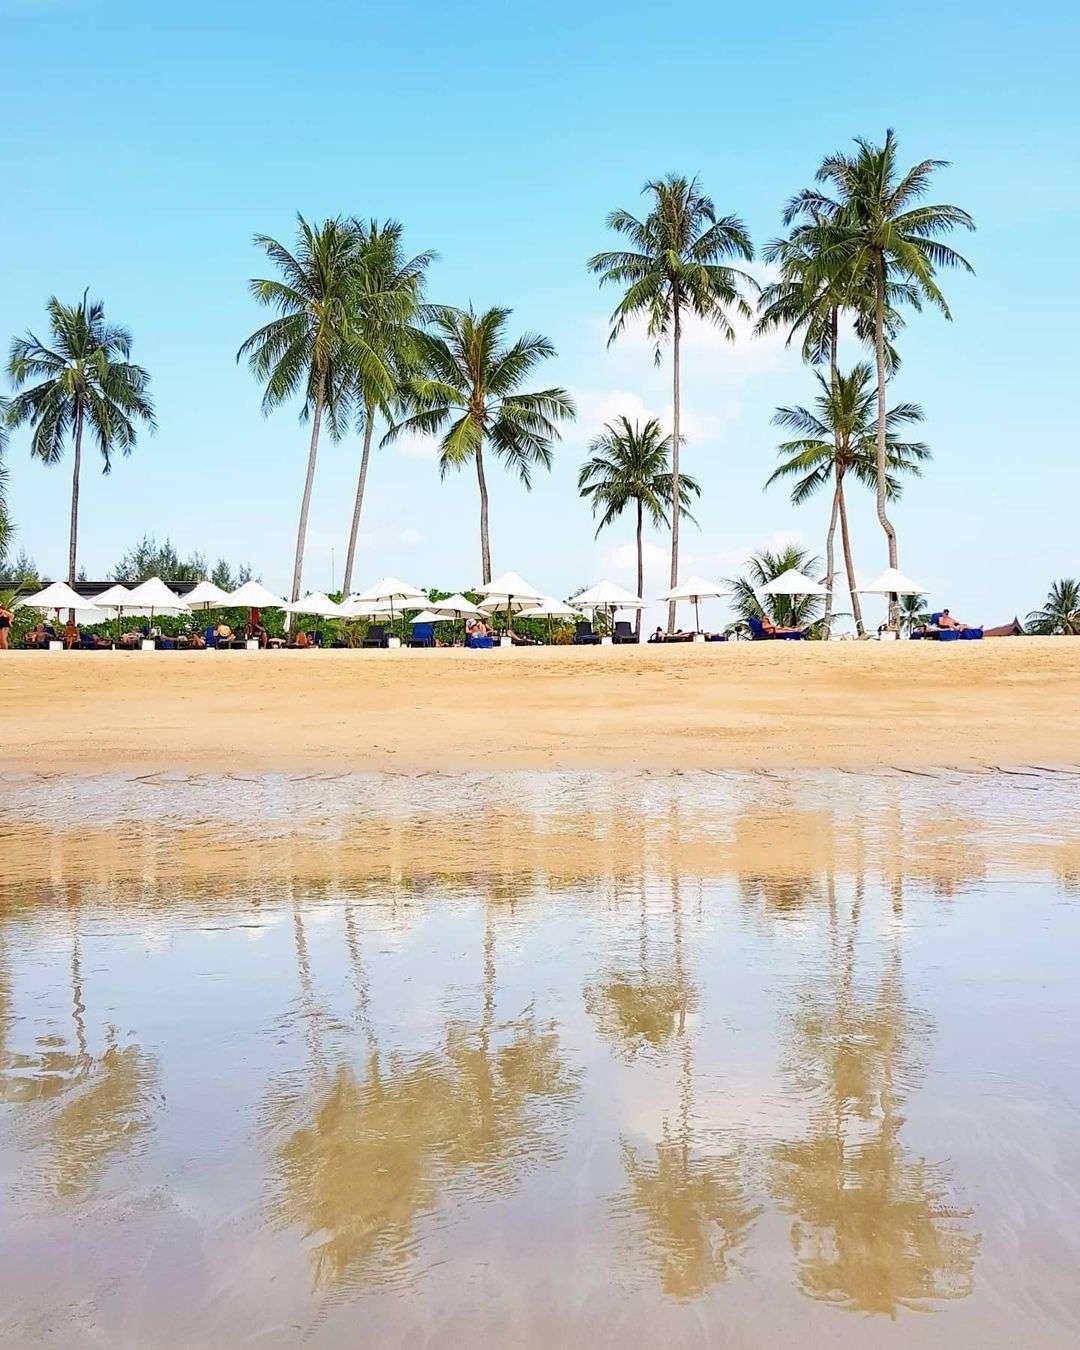 Palm trees on Khuk Khak Beach in Khao Lak